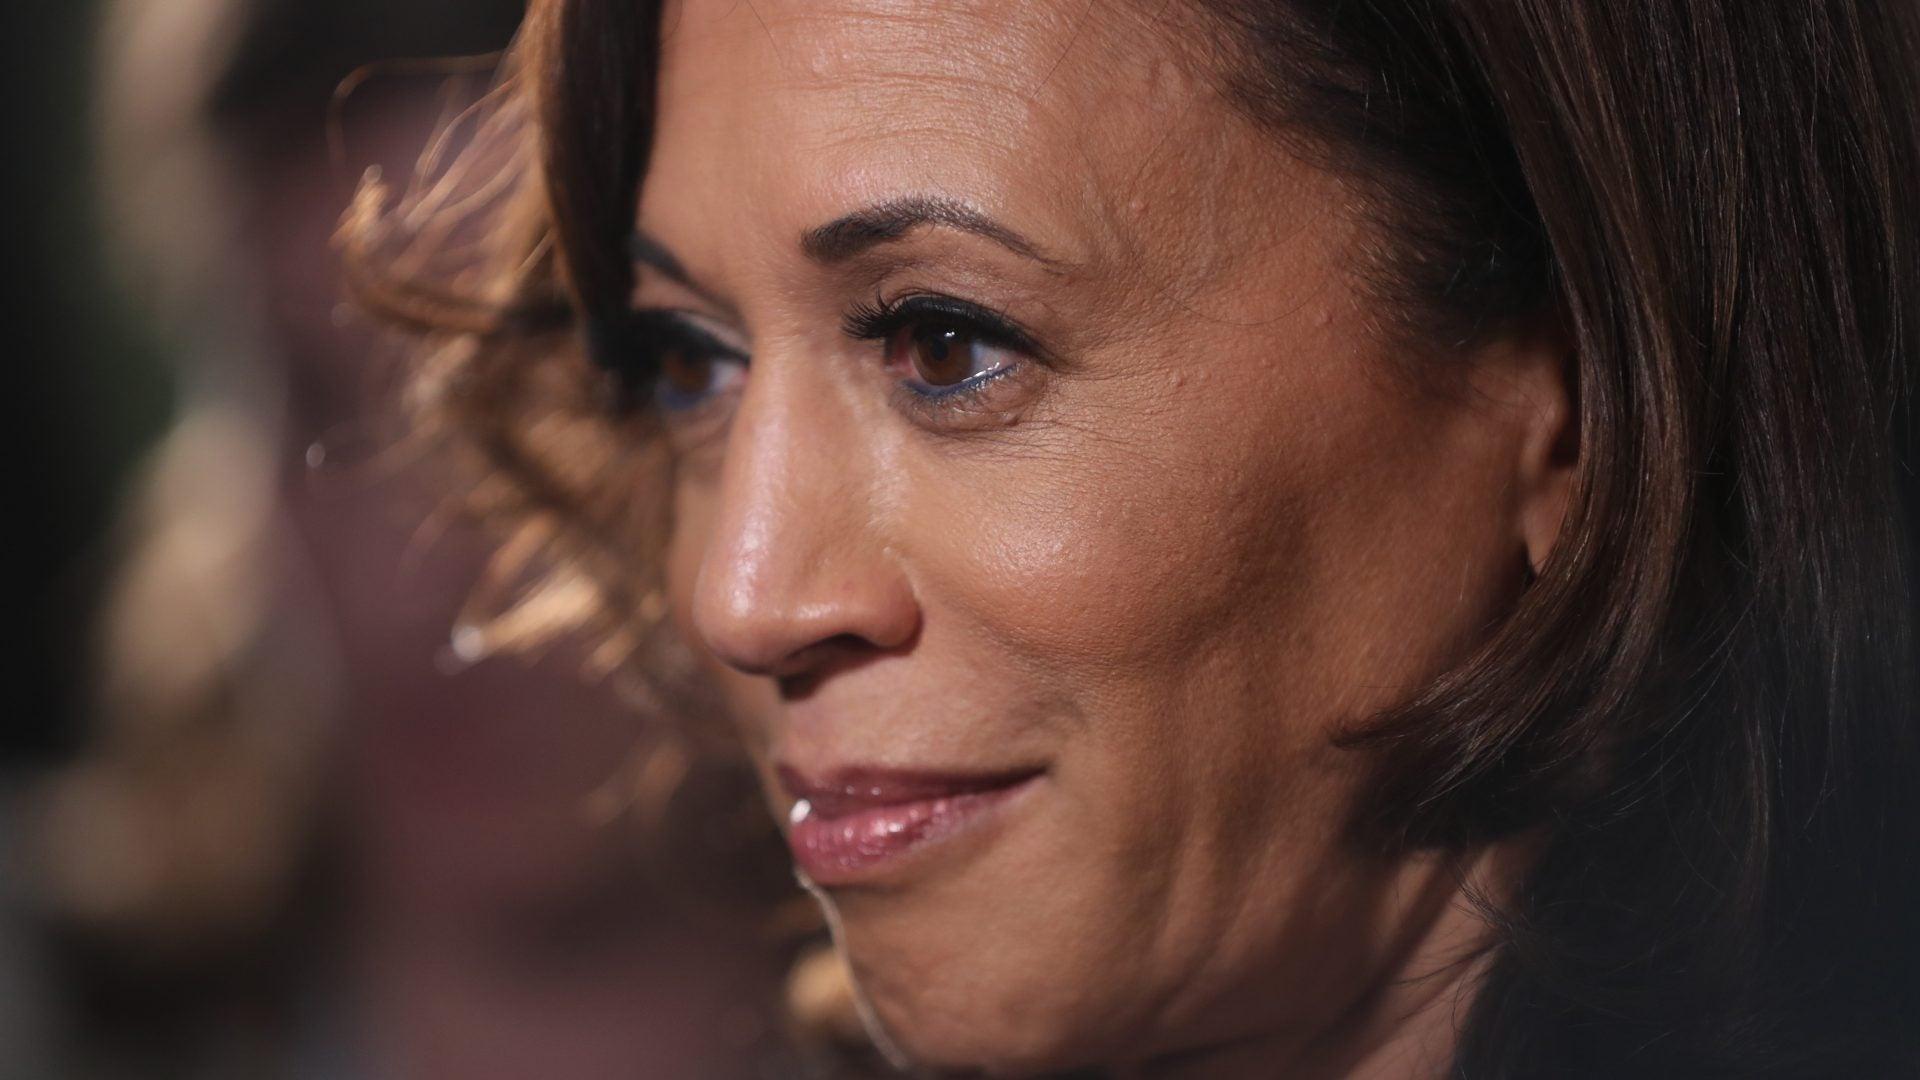 Democratic Candidates Condemn 'Attacks' on Sen. Harris' Race